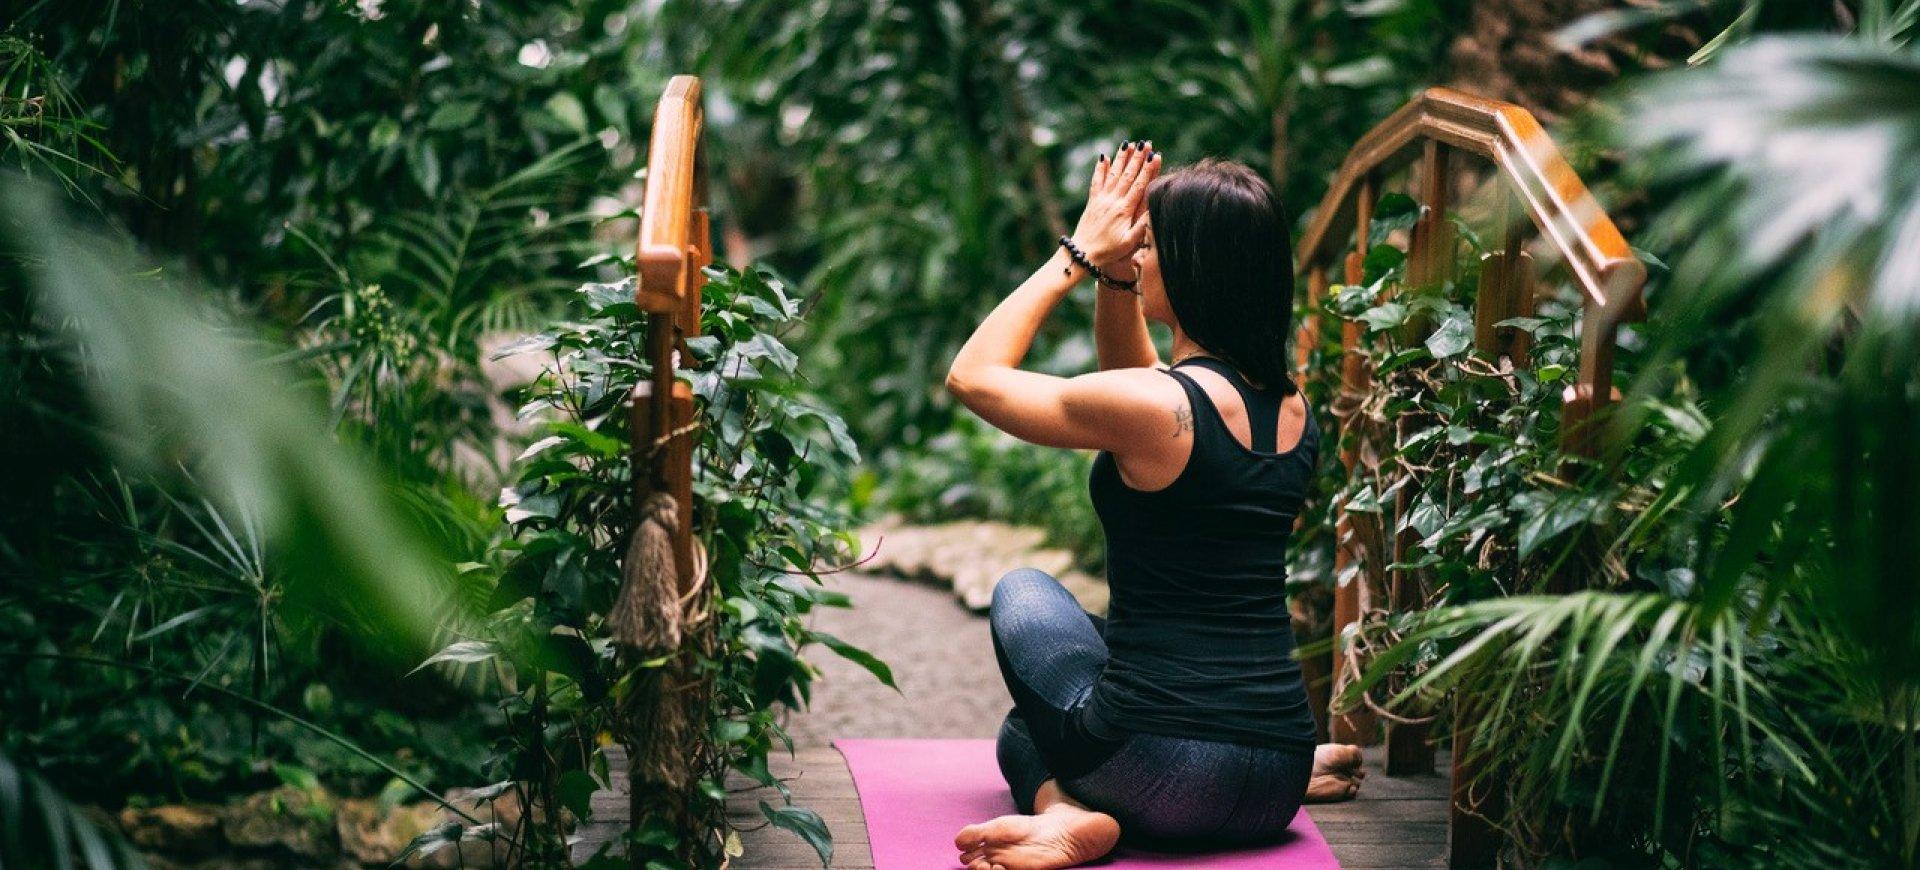 Poranna Mindful Yoga & Relax  27.02.2021, godz. 6:30-7:30 ❤